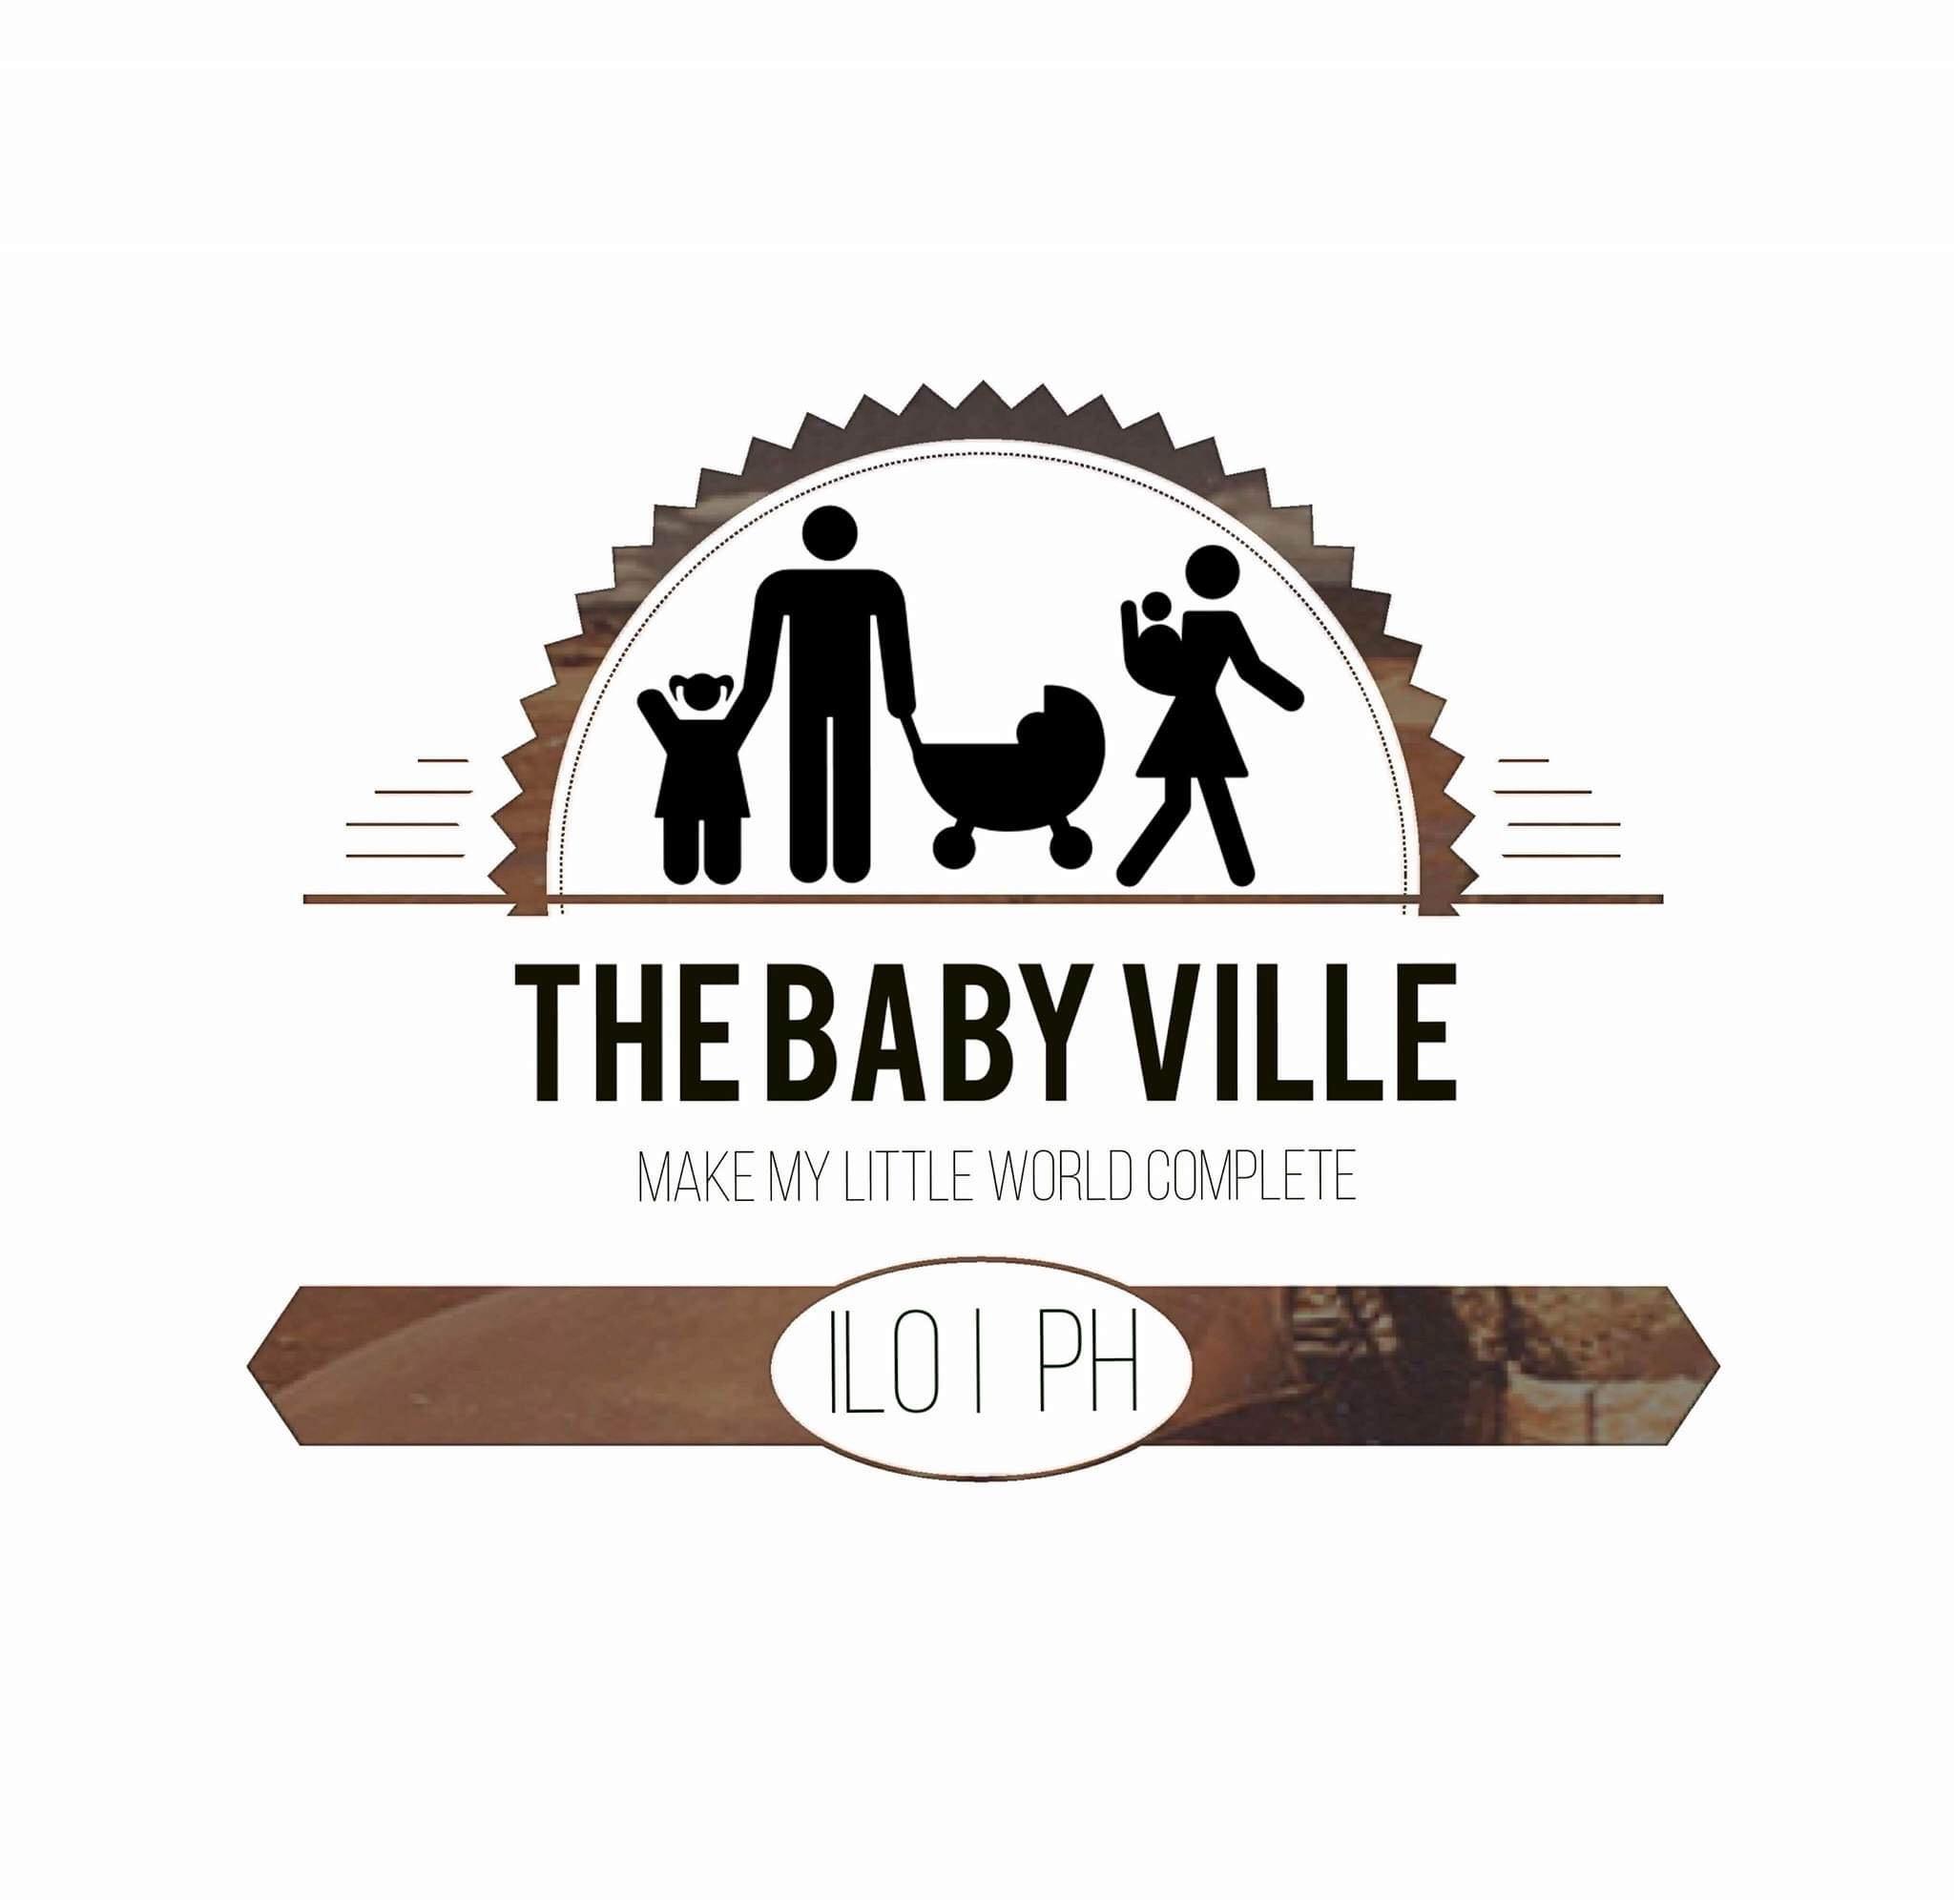 Babyville Iloilo Philippines